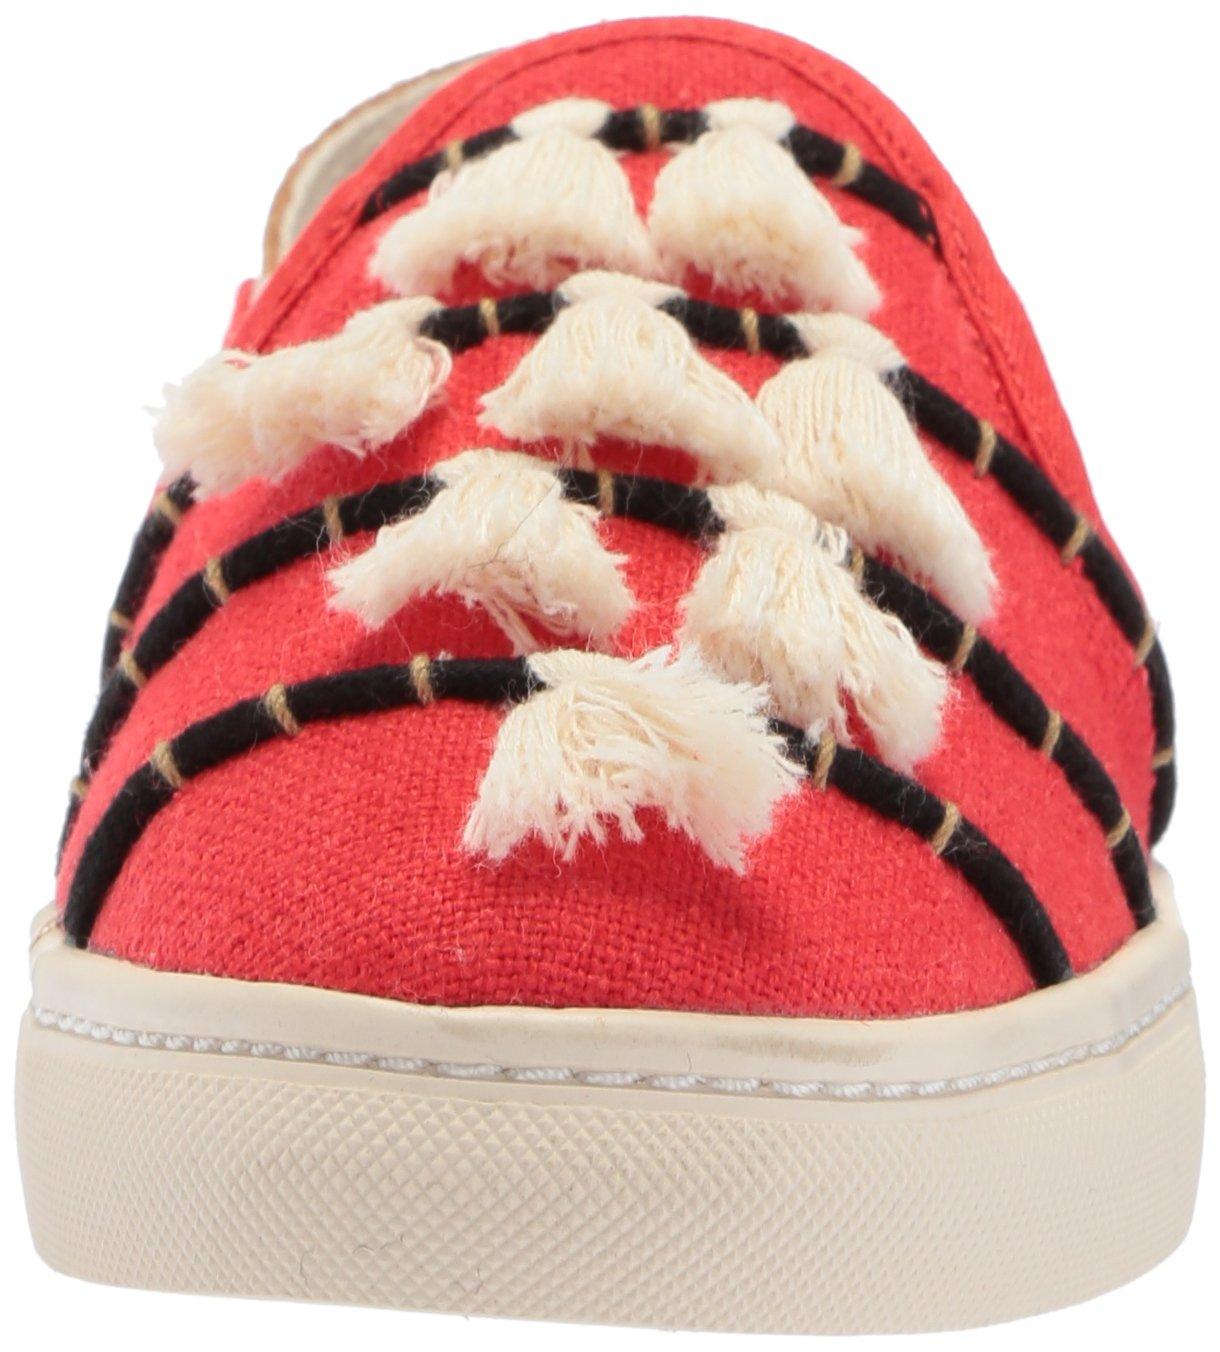 Soludos Women's Tassel Slip Sneaker, Red/Beige, 8 B US by Soludos (Image #4)